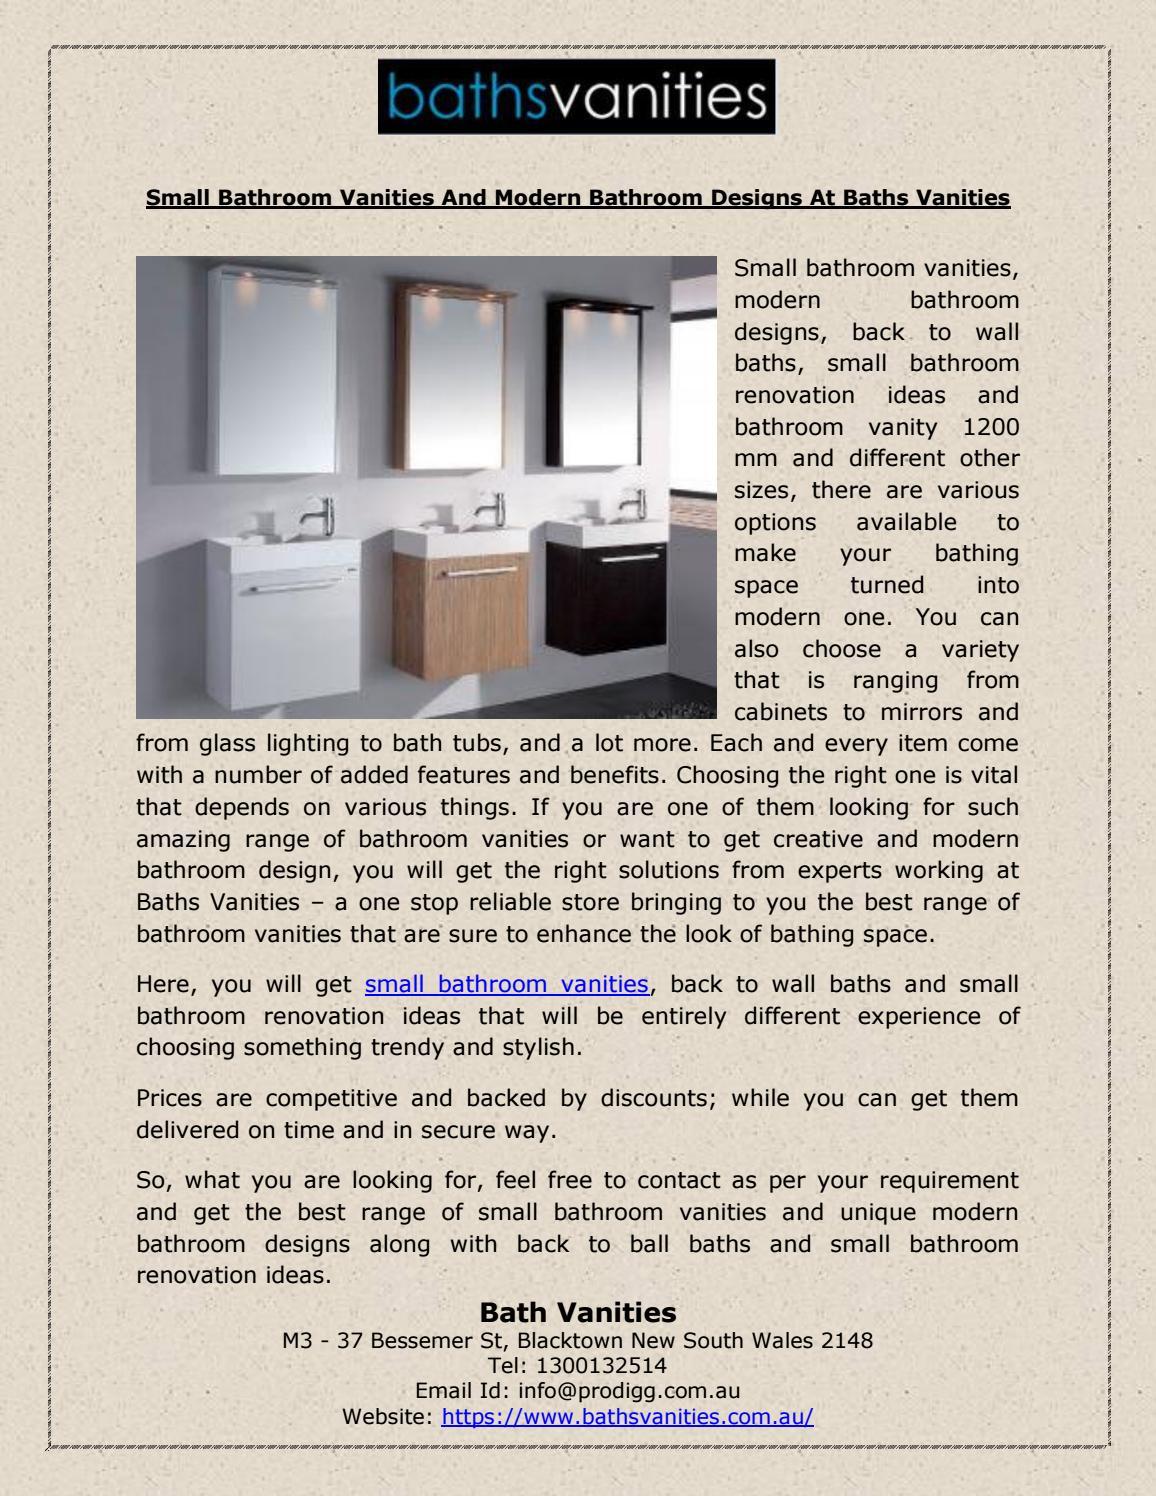 Small Bathroom Vanities And Modern Bathroom Designs At Baths Vanities By Baths Vanities Issuu